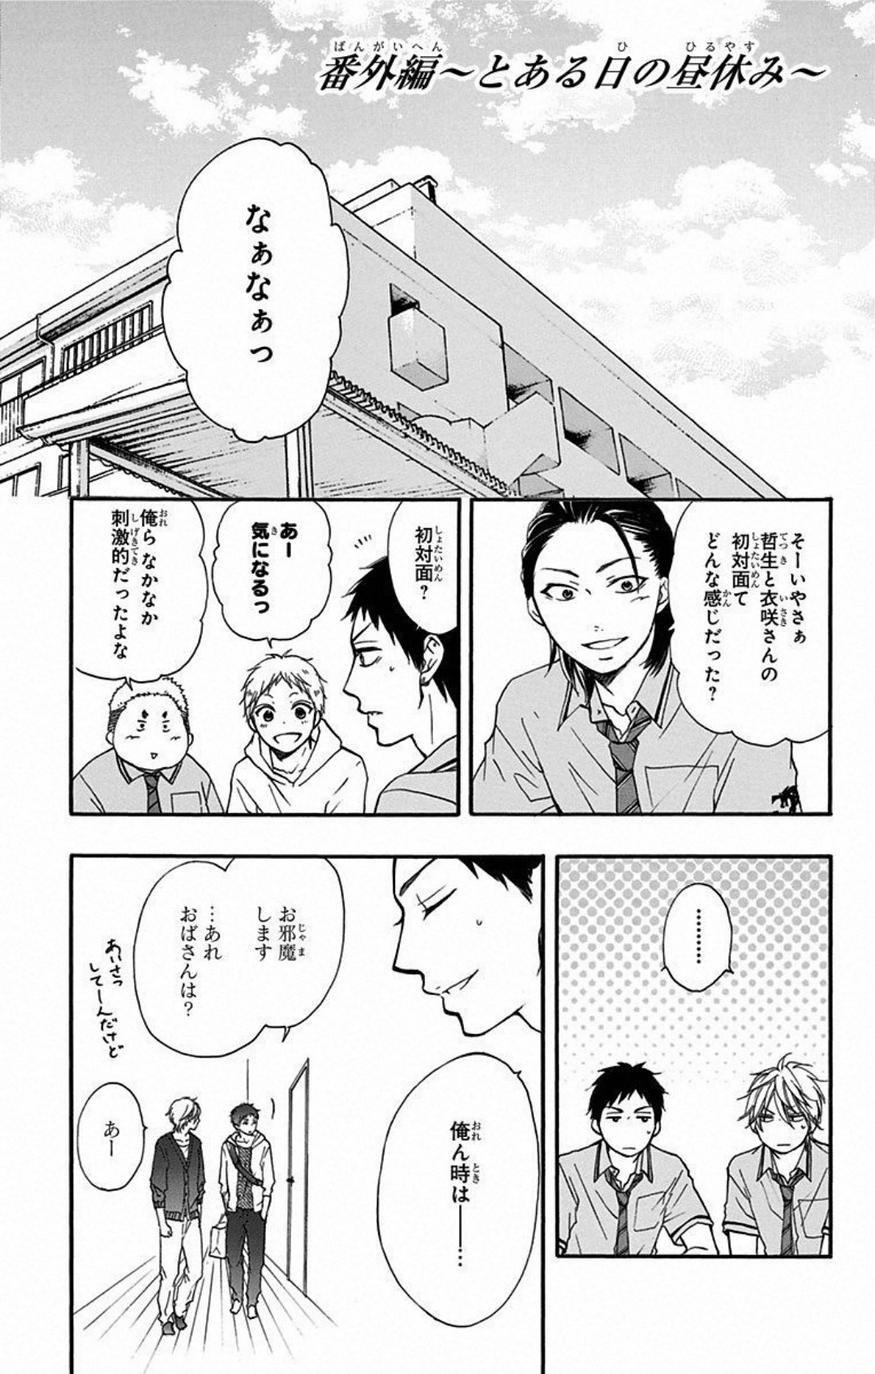 Kono Oto Tomare! - Chapter 35.5 - Page 1